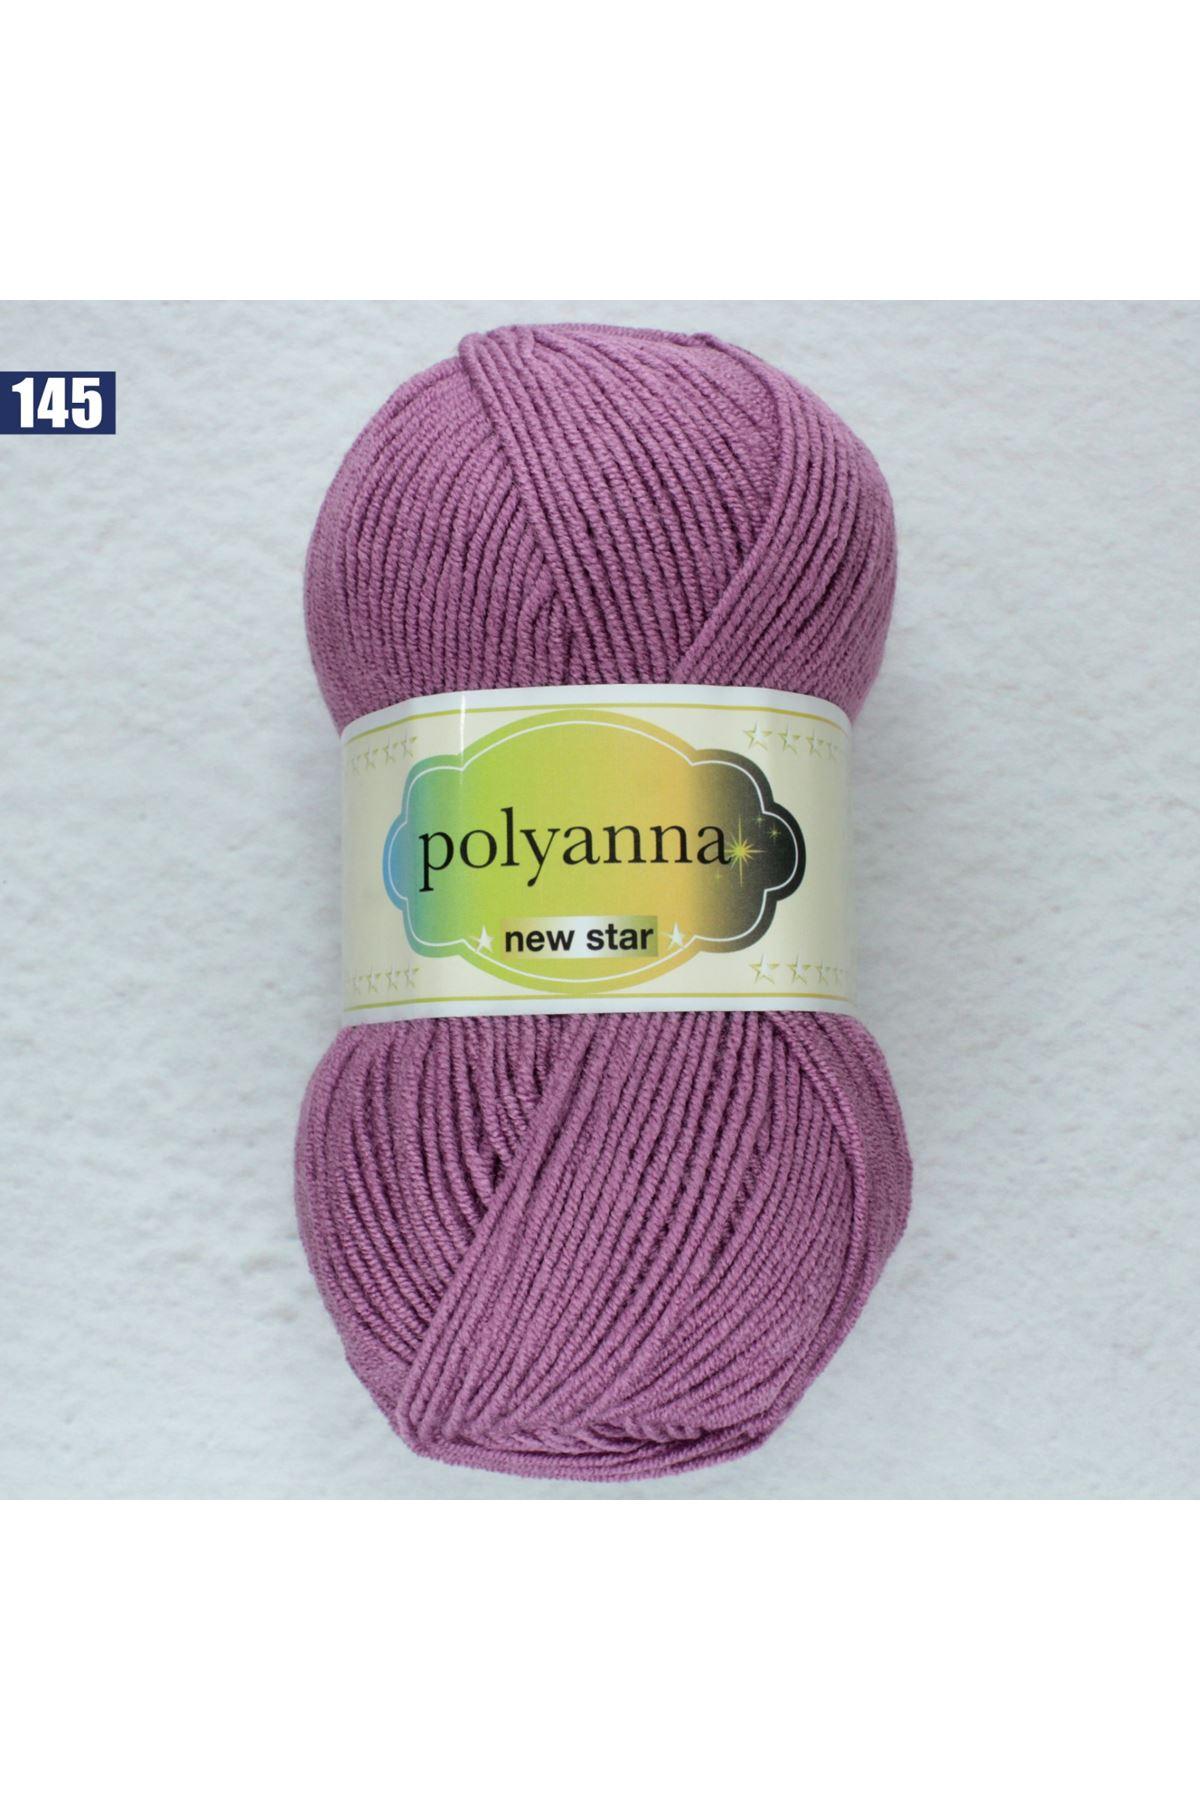 Polyanna New Star 145